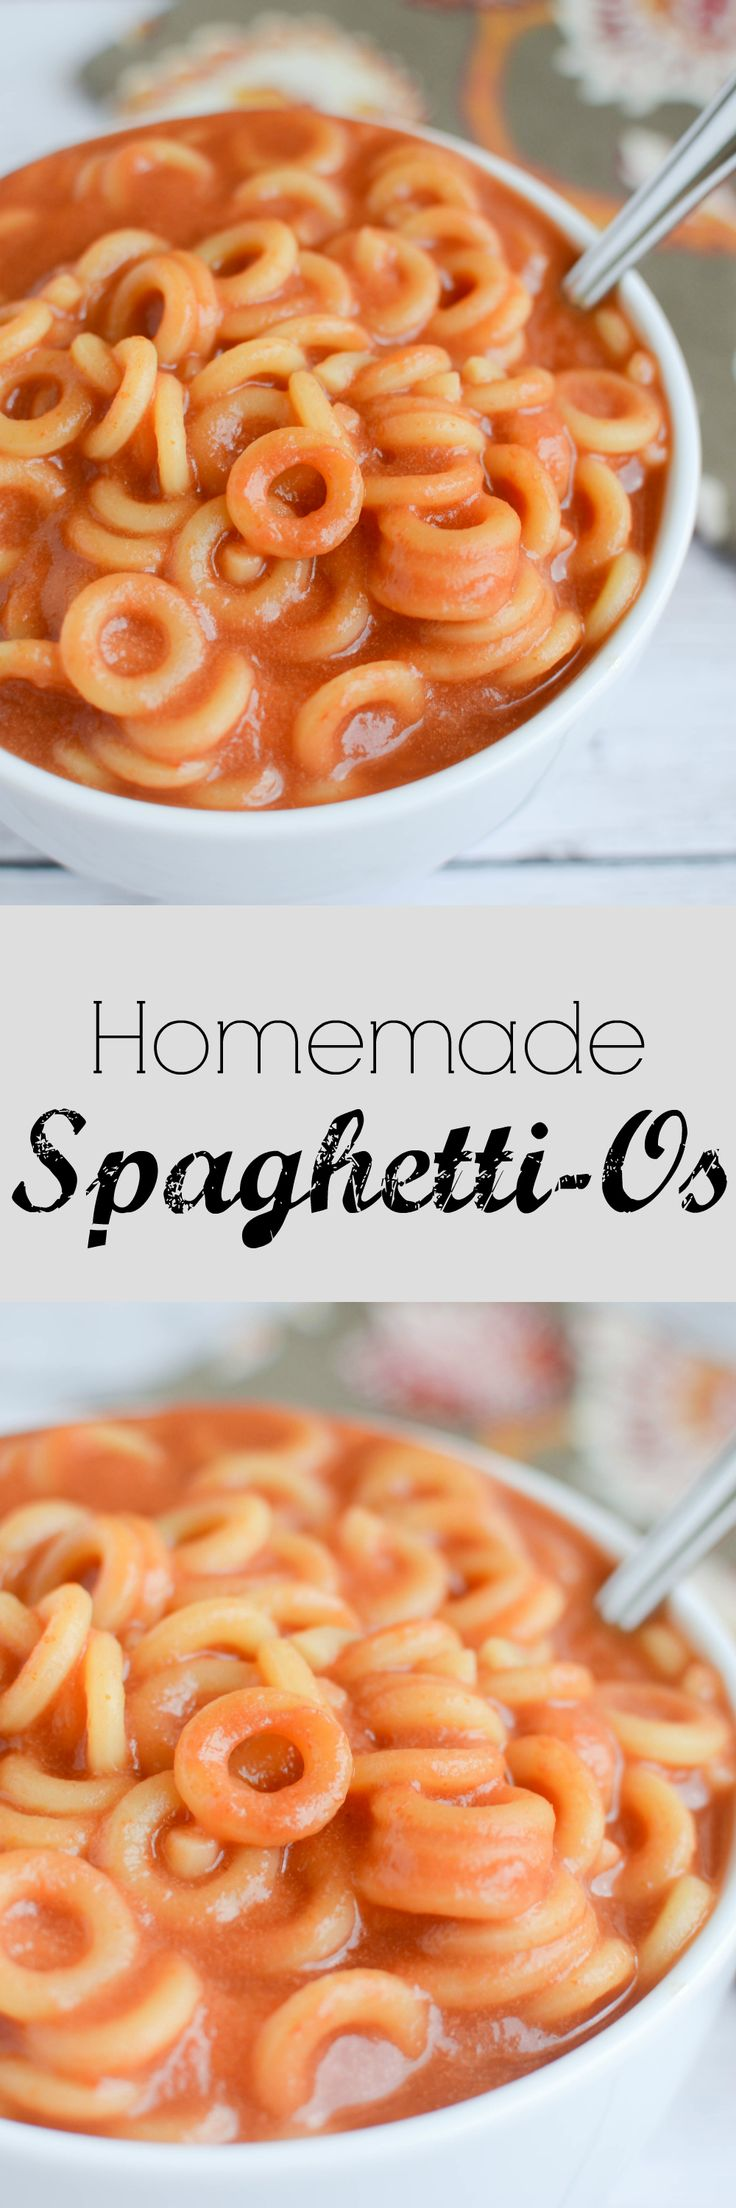 Homemade Spaghetti-Os Recipe via @fakeginger